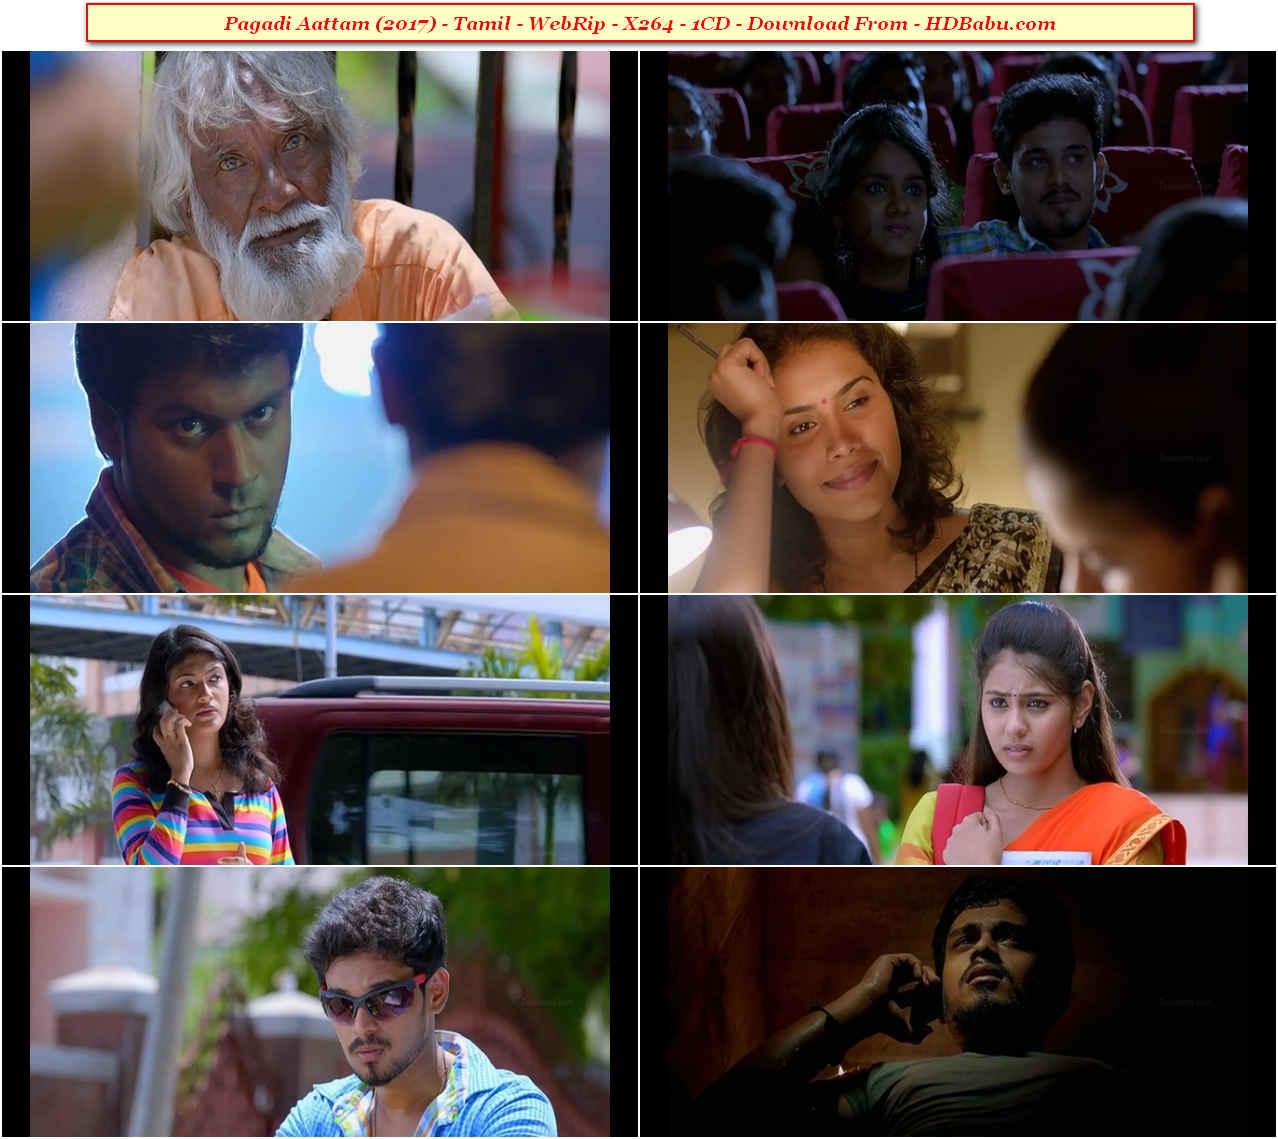 Pagadi Aattam Full Movie Download